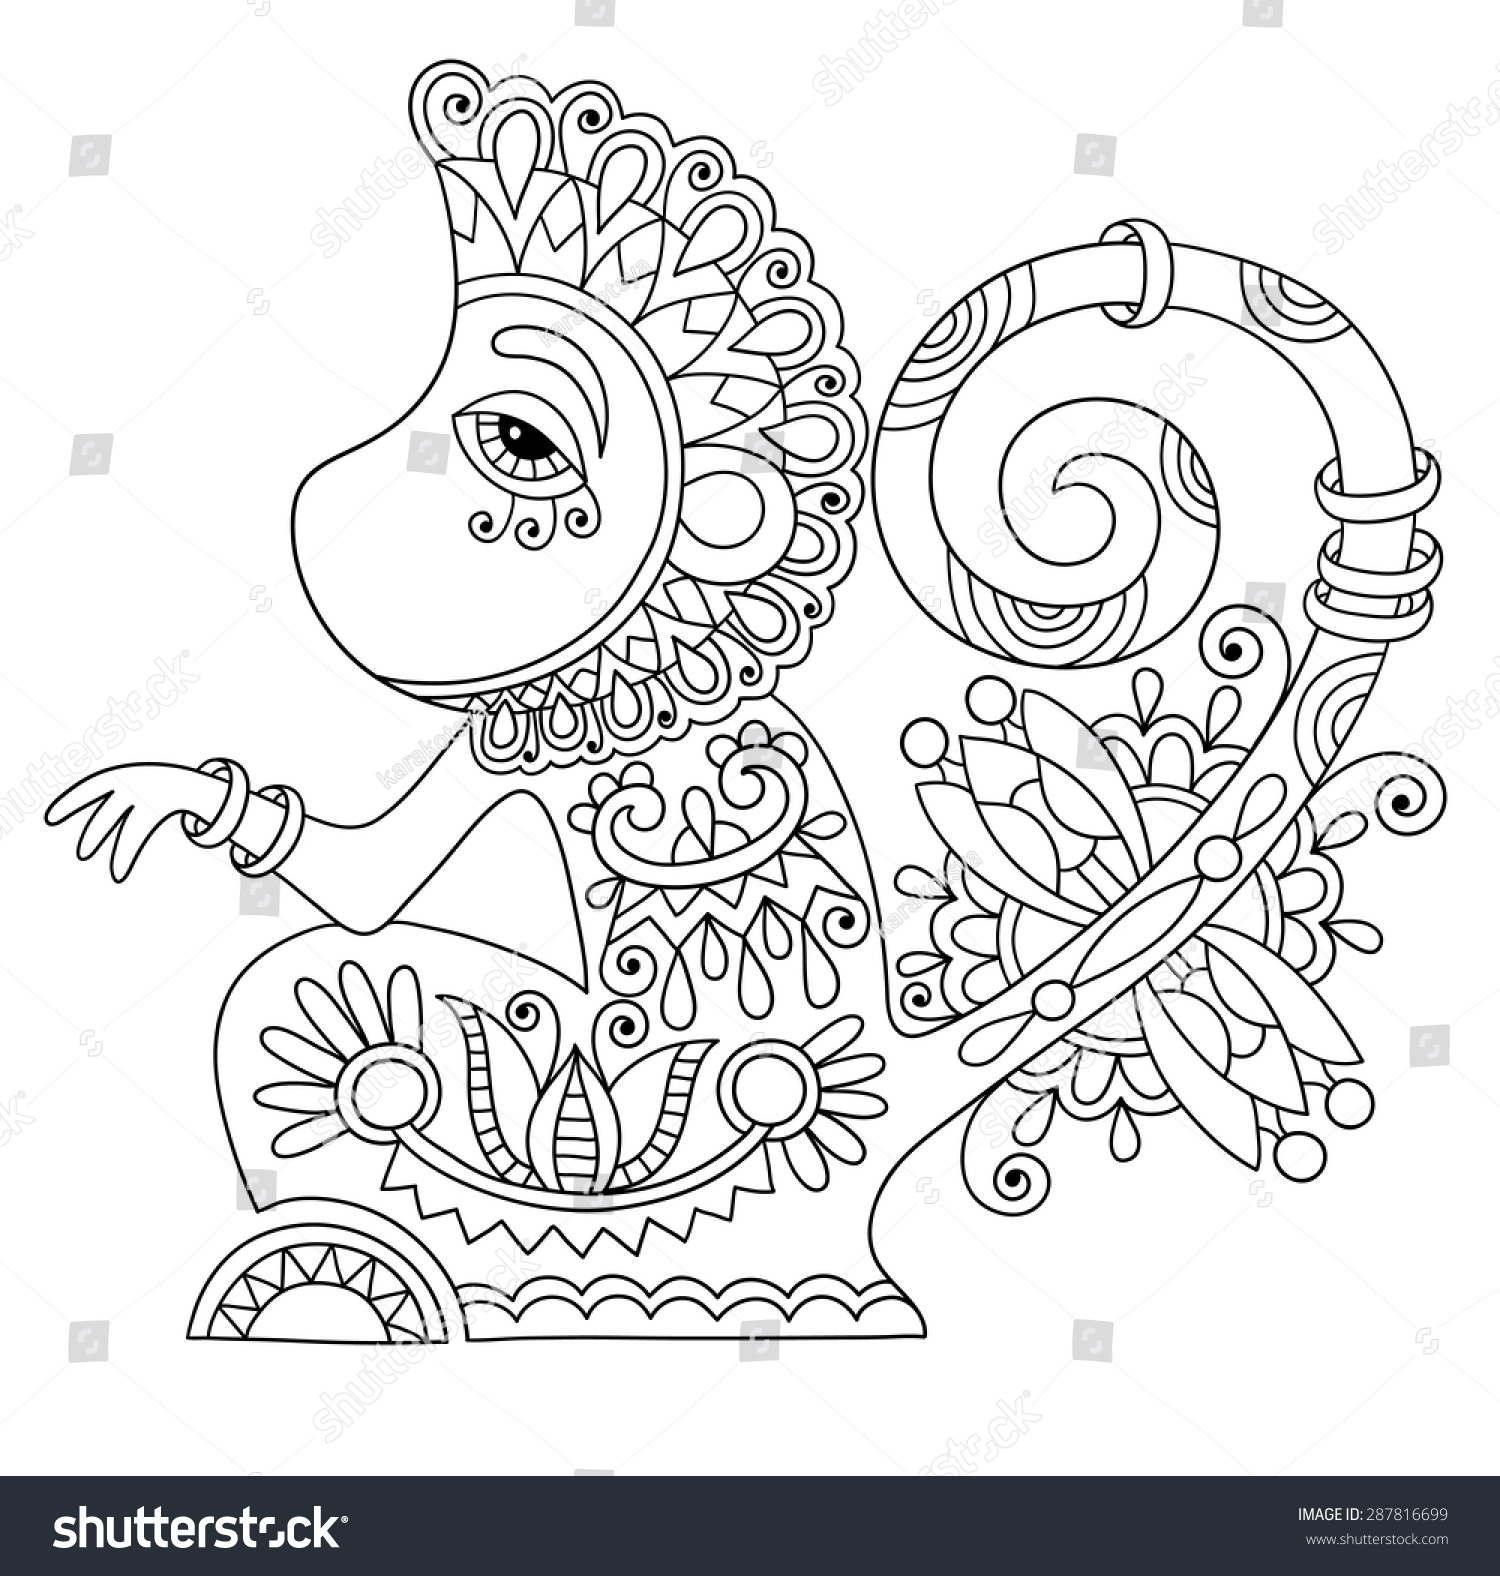 Line Art Monkey : Line art drawing ethnic monkey decorative stock vector